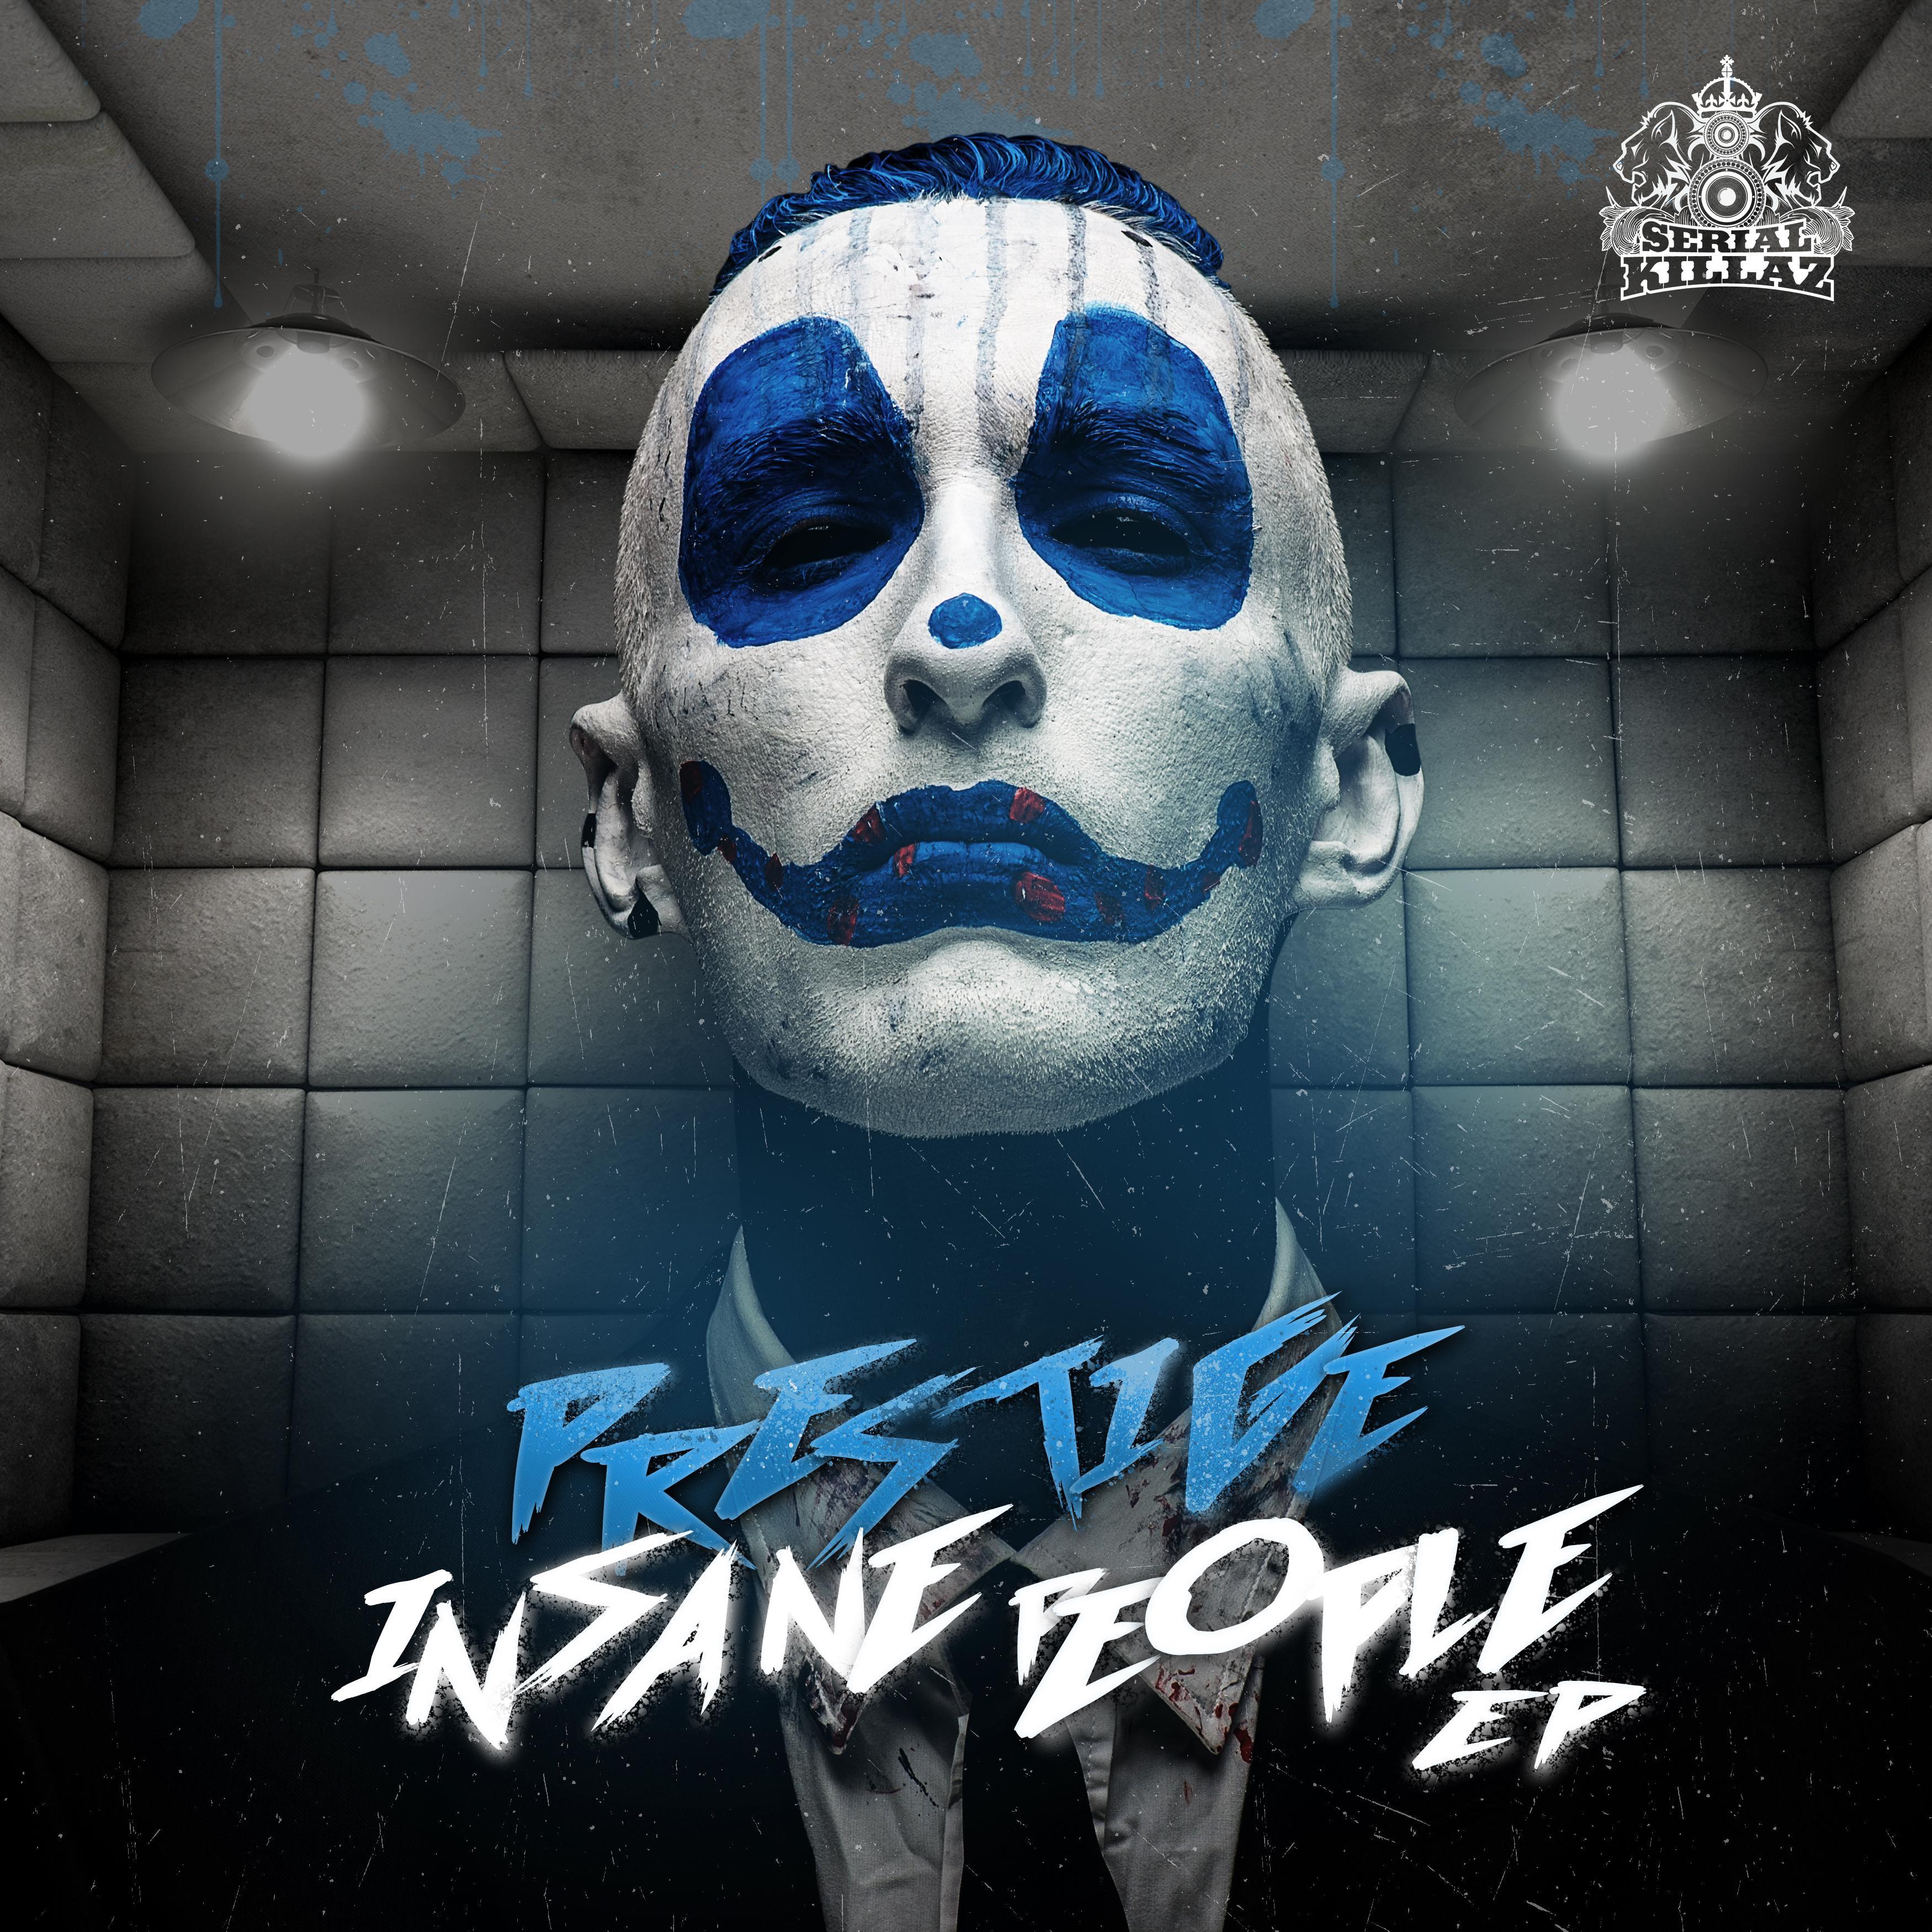 Prestige - Insane People EP